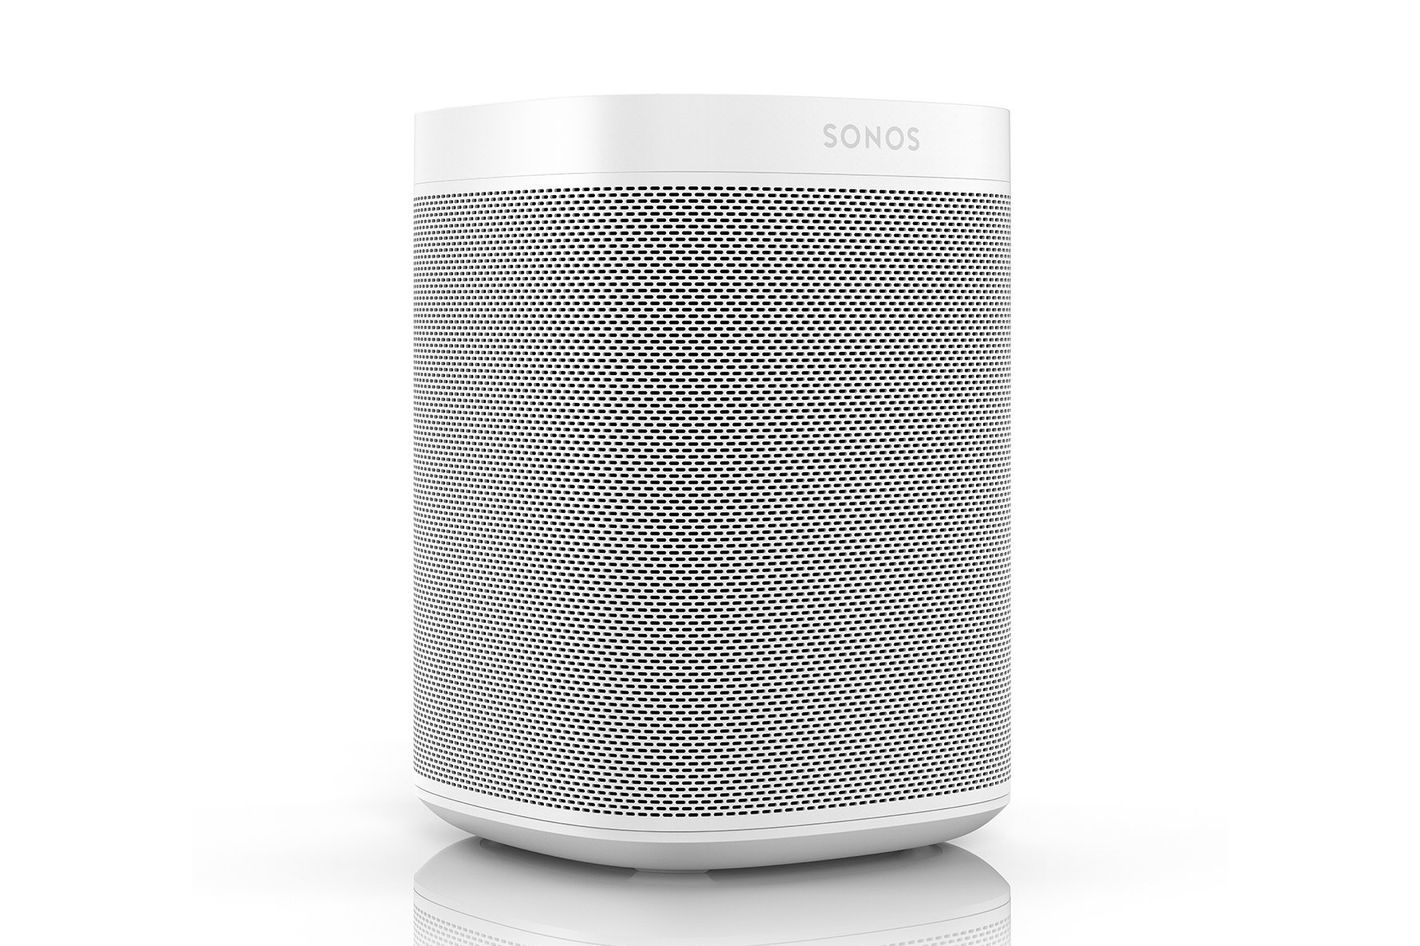 Sonos One: The Smart Speaker for Music Lovers